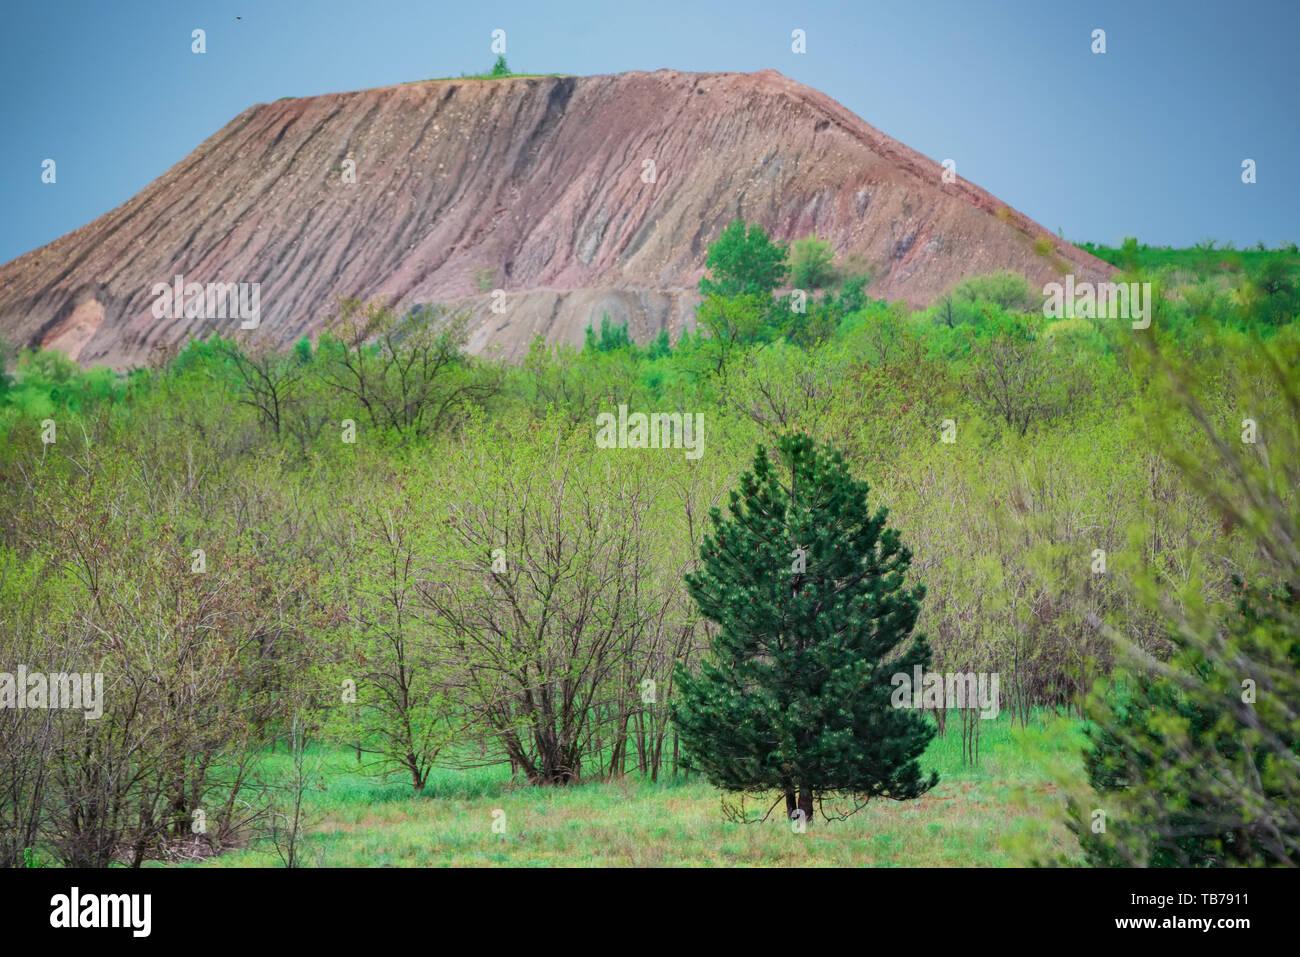 Blick auf Beute Tipp in Grün steppe Stockbild